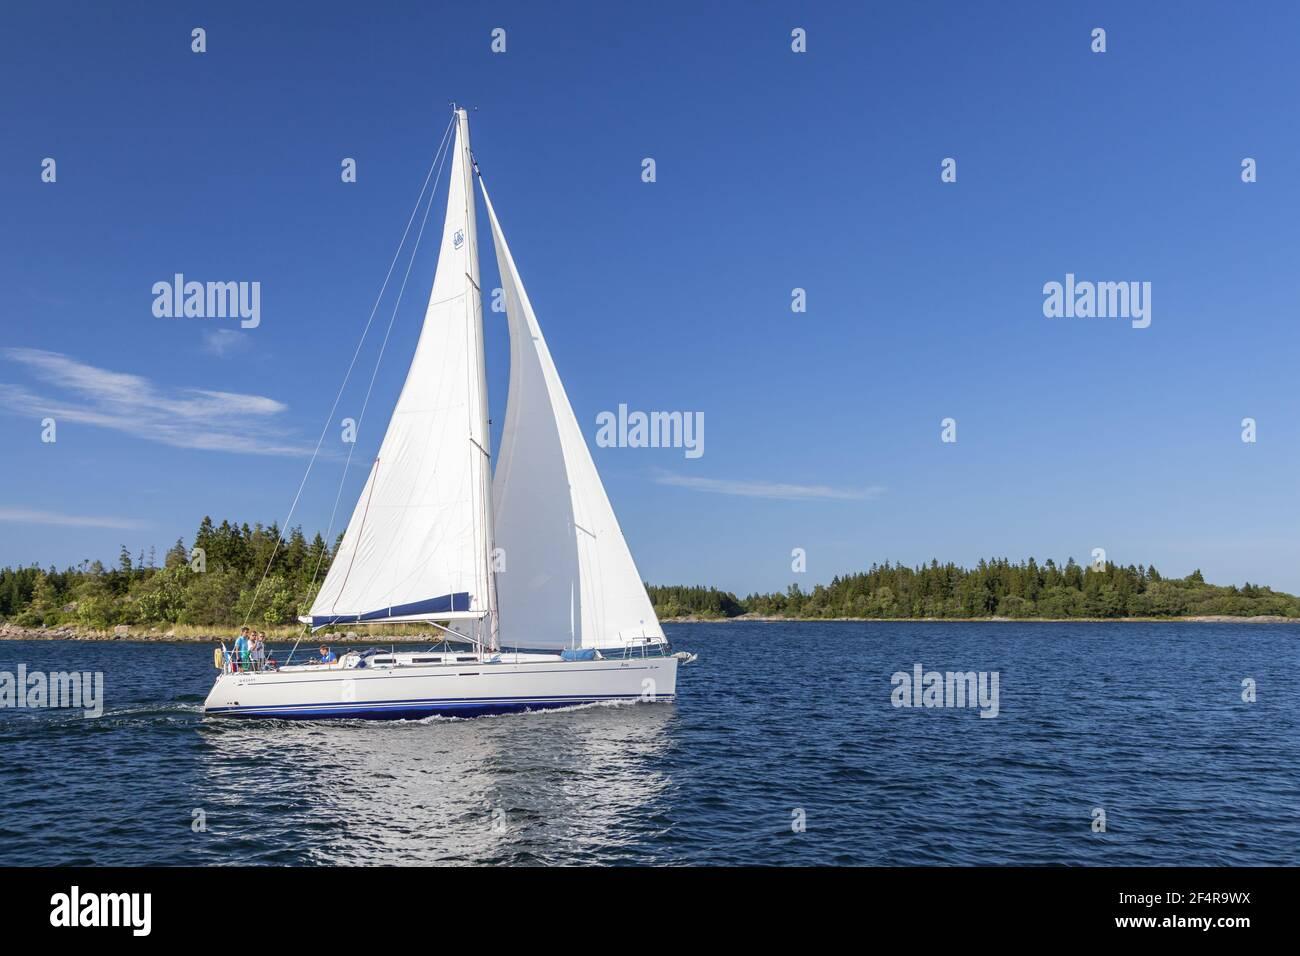 Geografia / viaggio, Svezia, Stoccolma laen, Stoccolma skaergård, yachtsman di fronte all'isola Fejan, Additional-Rights-Clearance-Info-Not-Available Foto Stock